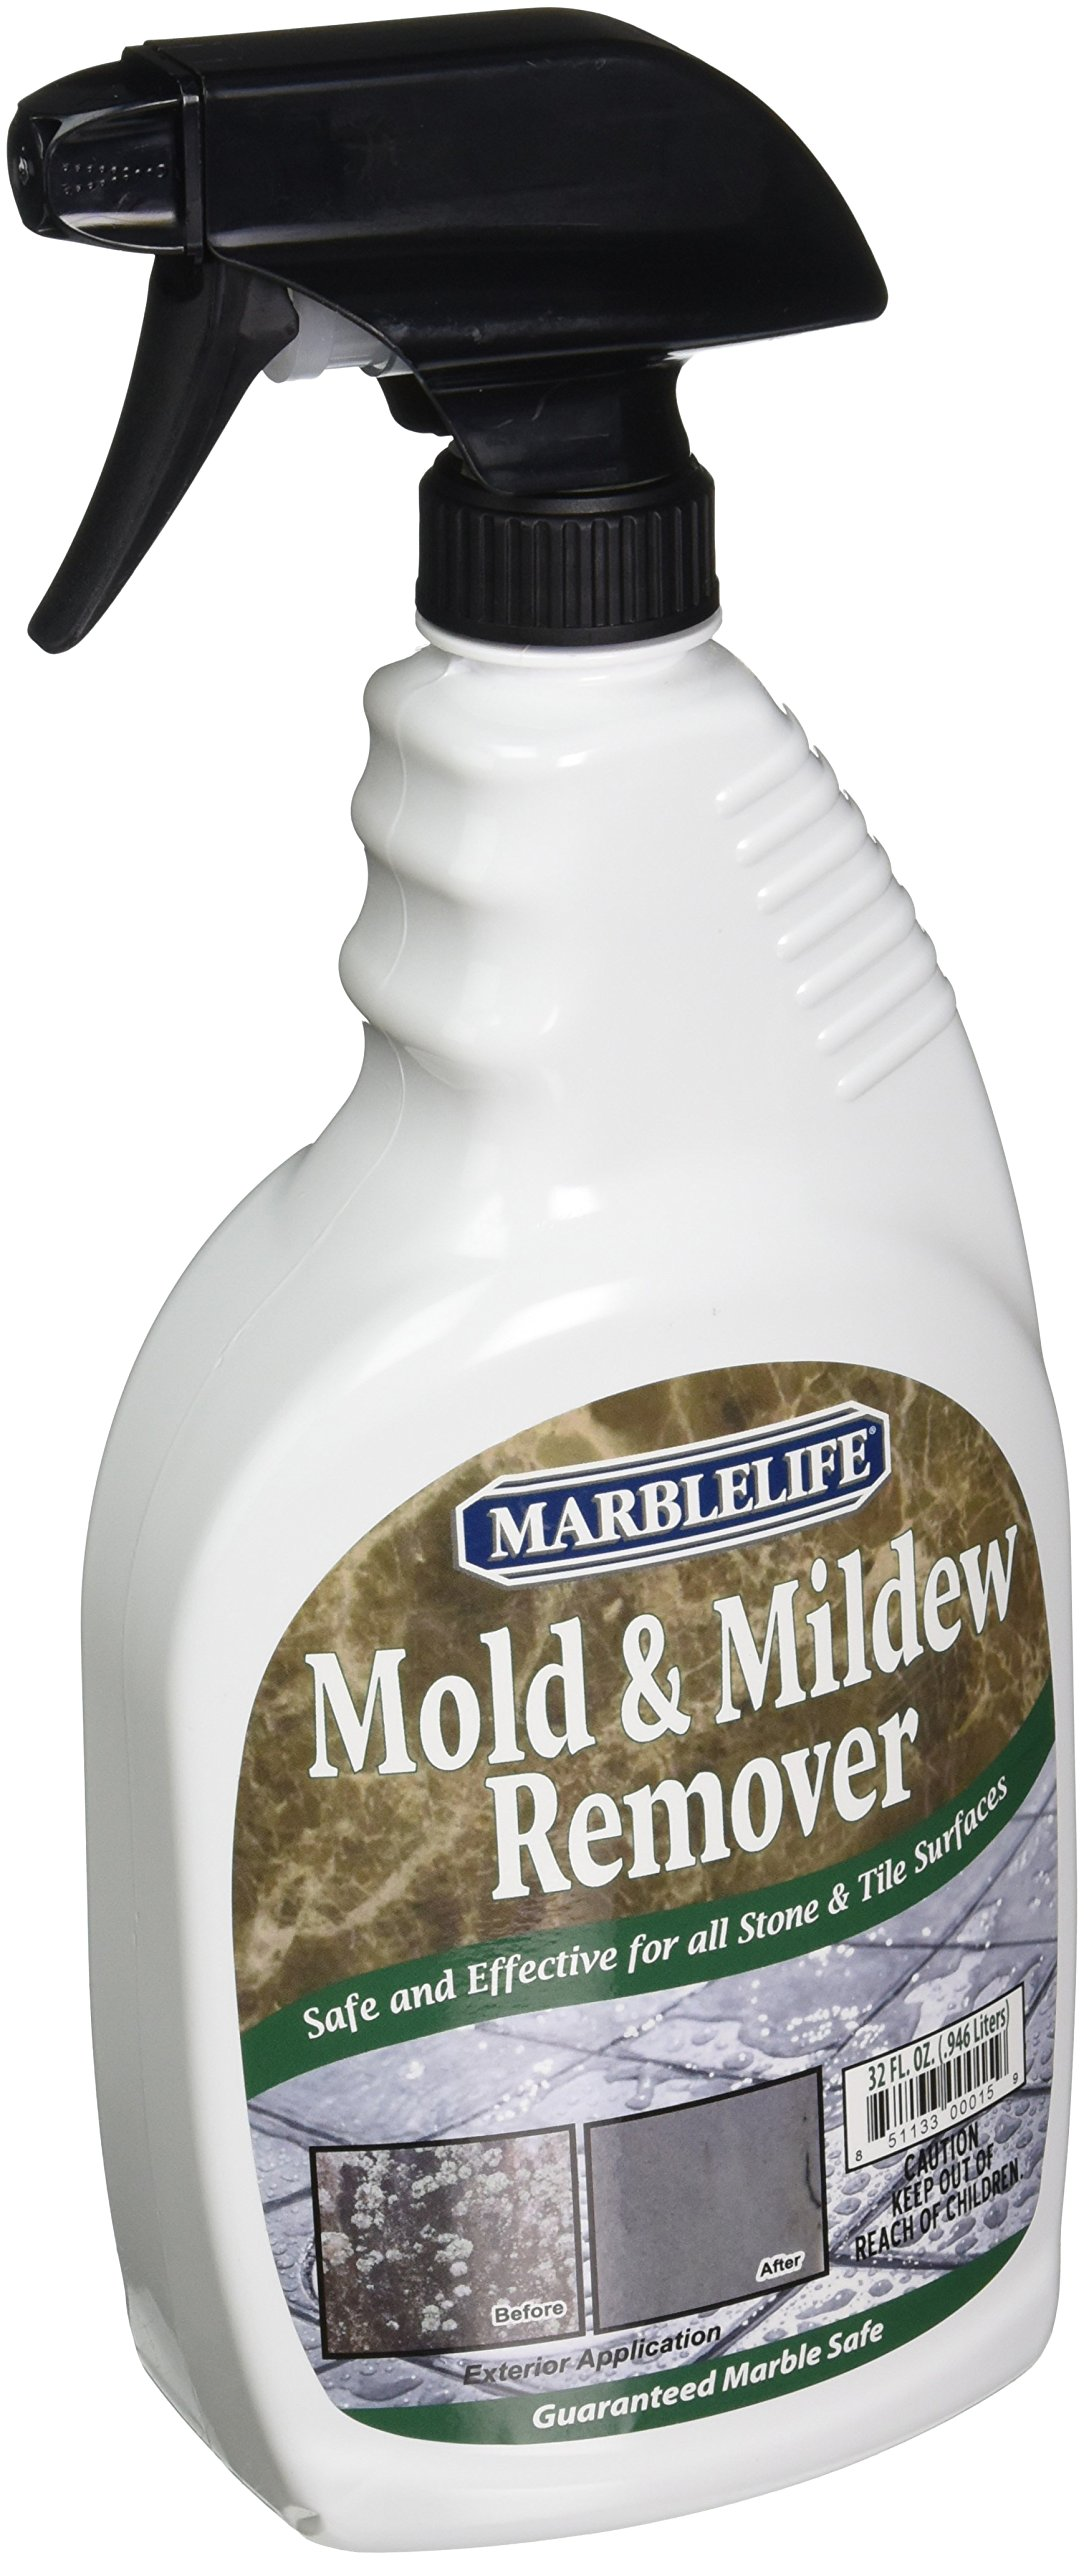 Amazon.com: Marblelife Soap Scum Remover, 15oz: Health & Personal Care